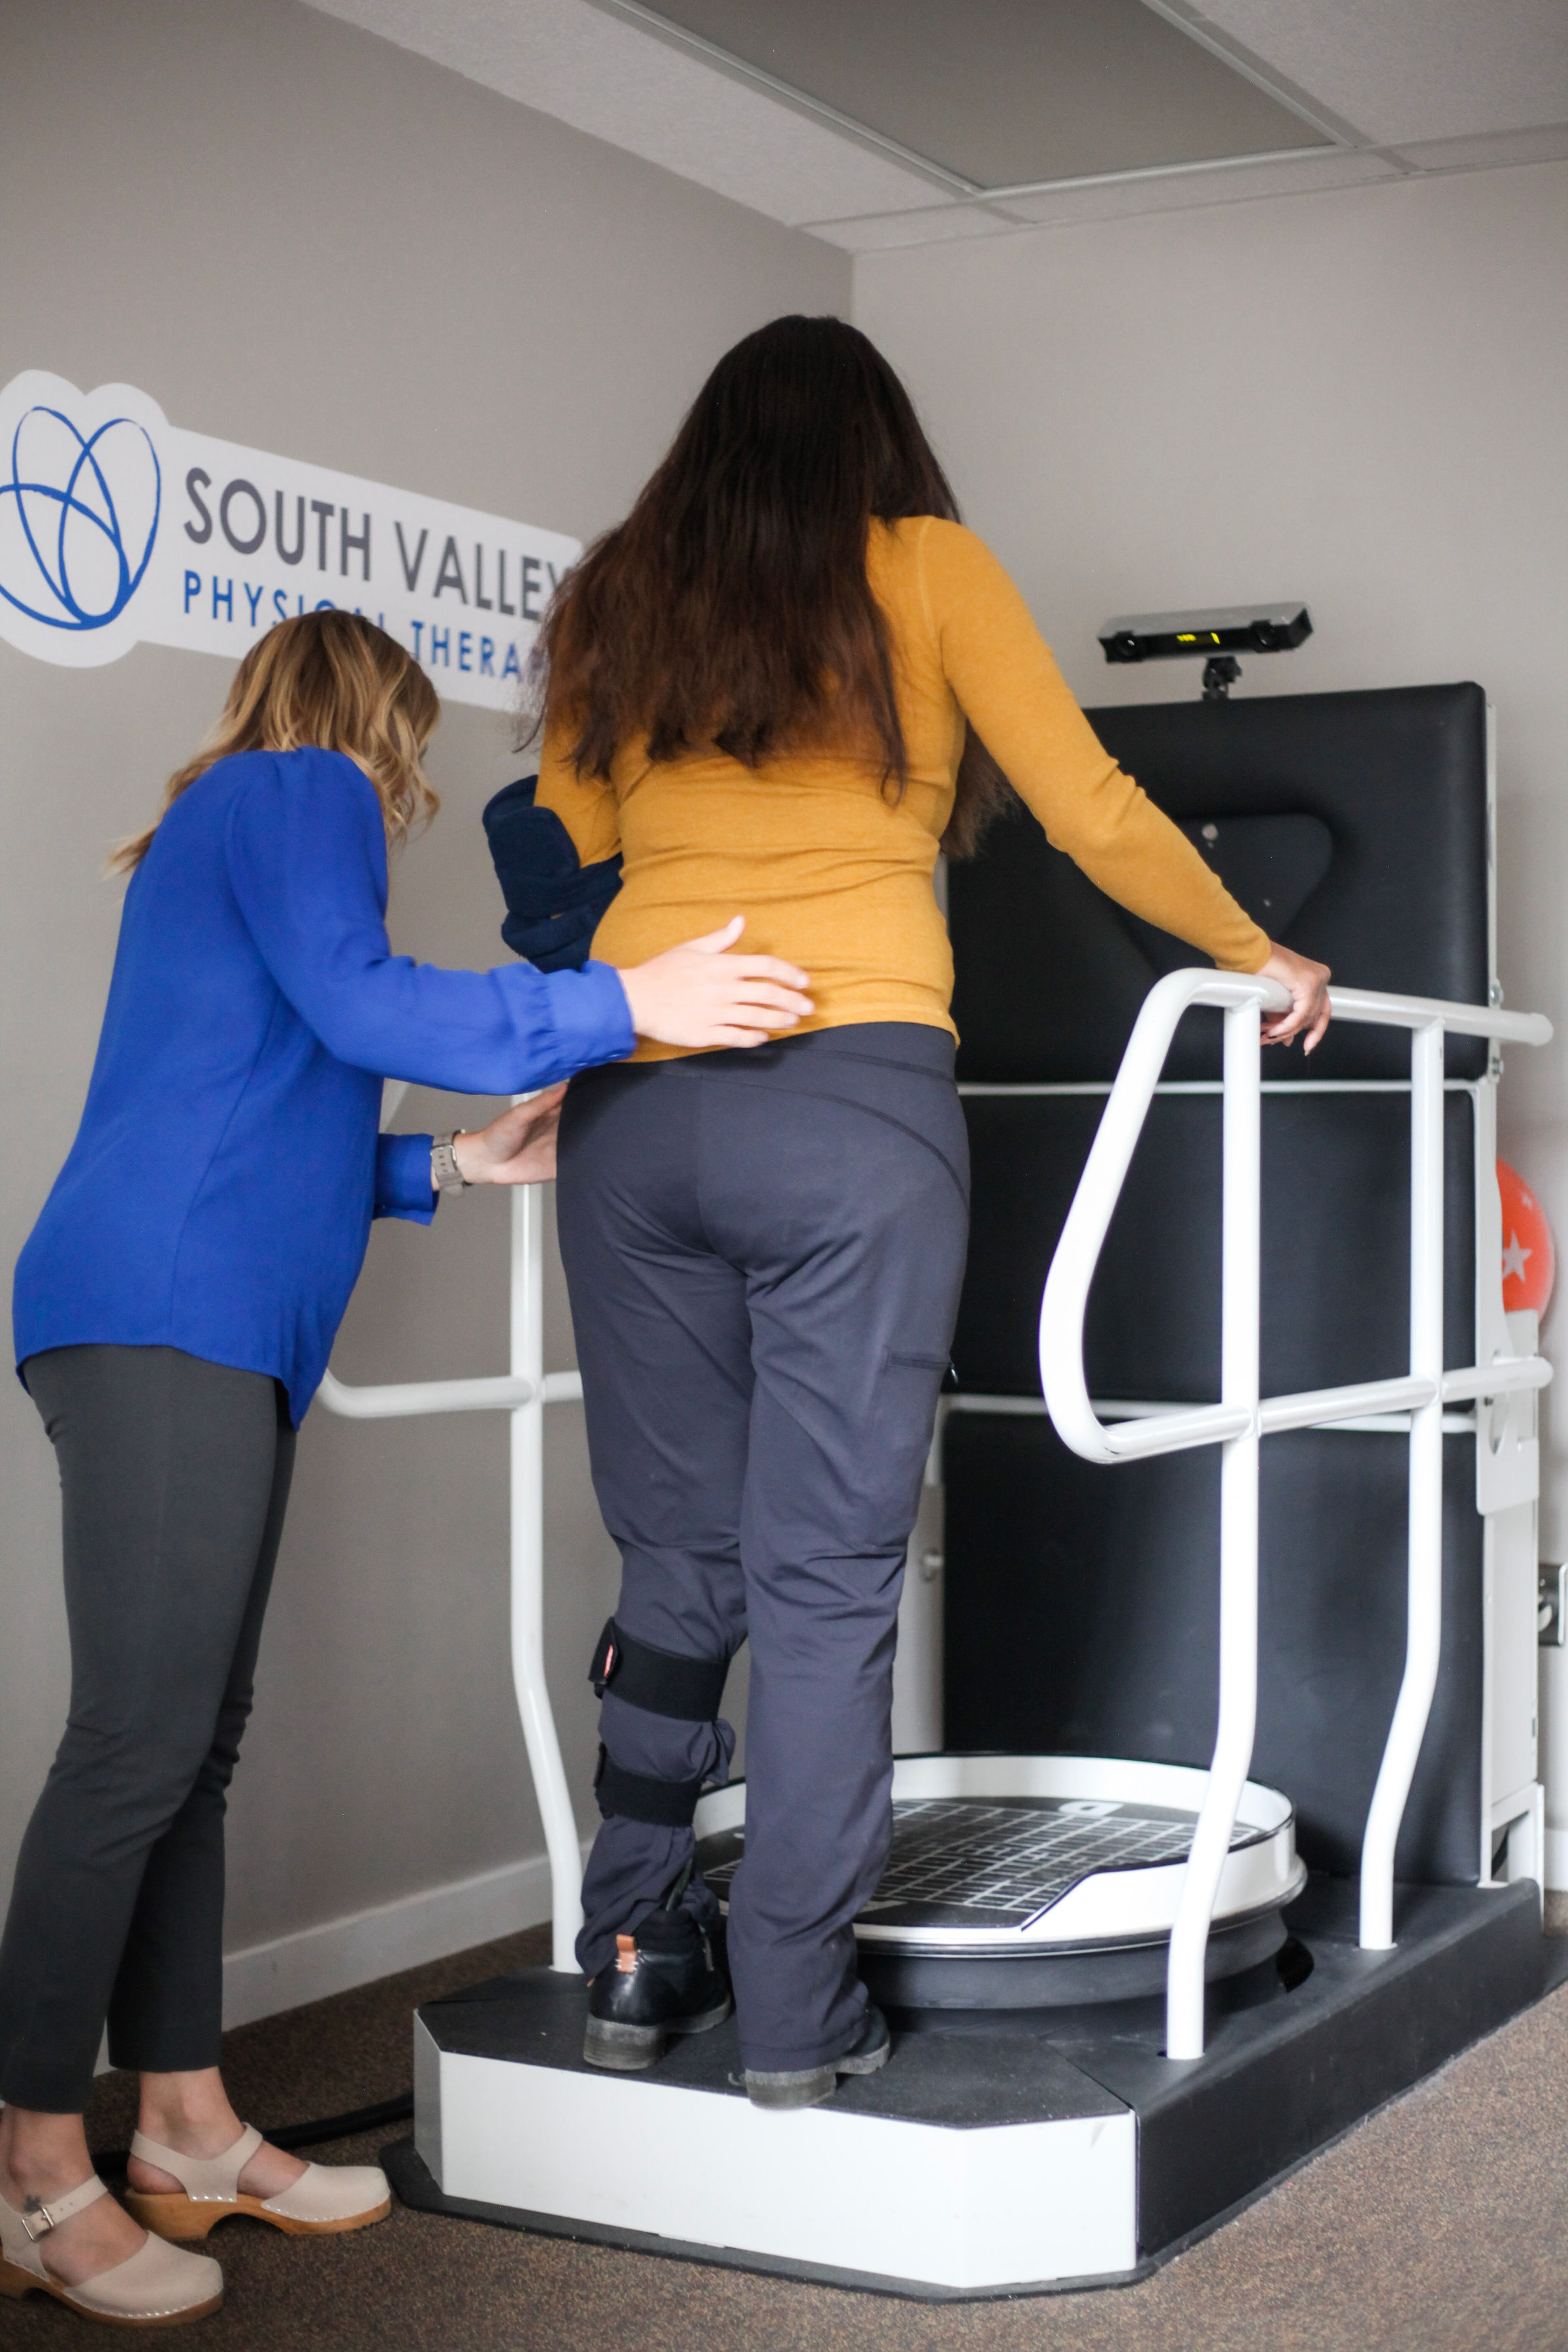 A woman stepping up to a balance machine.